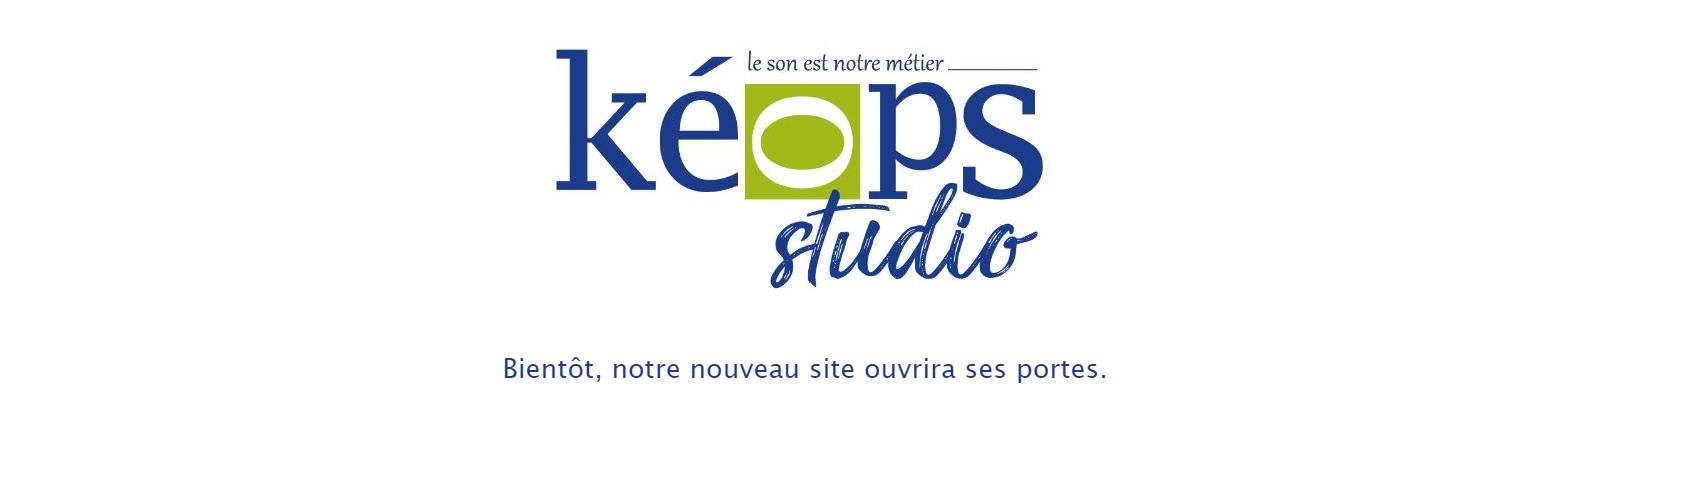 site keops par softup